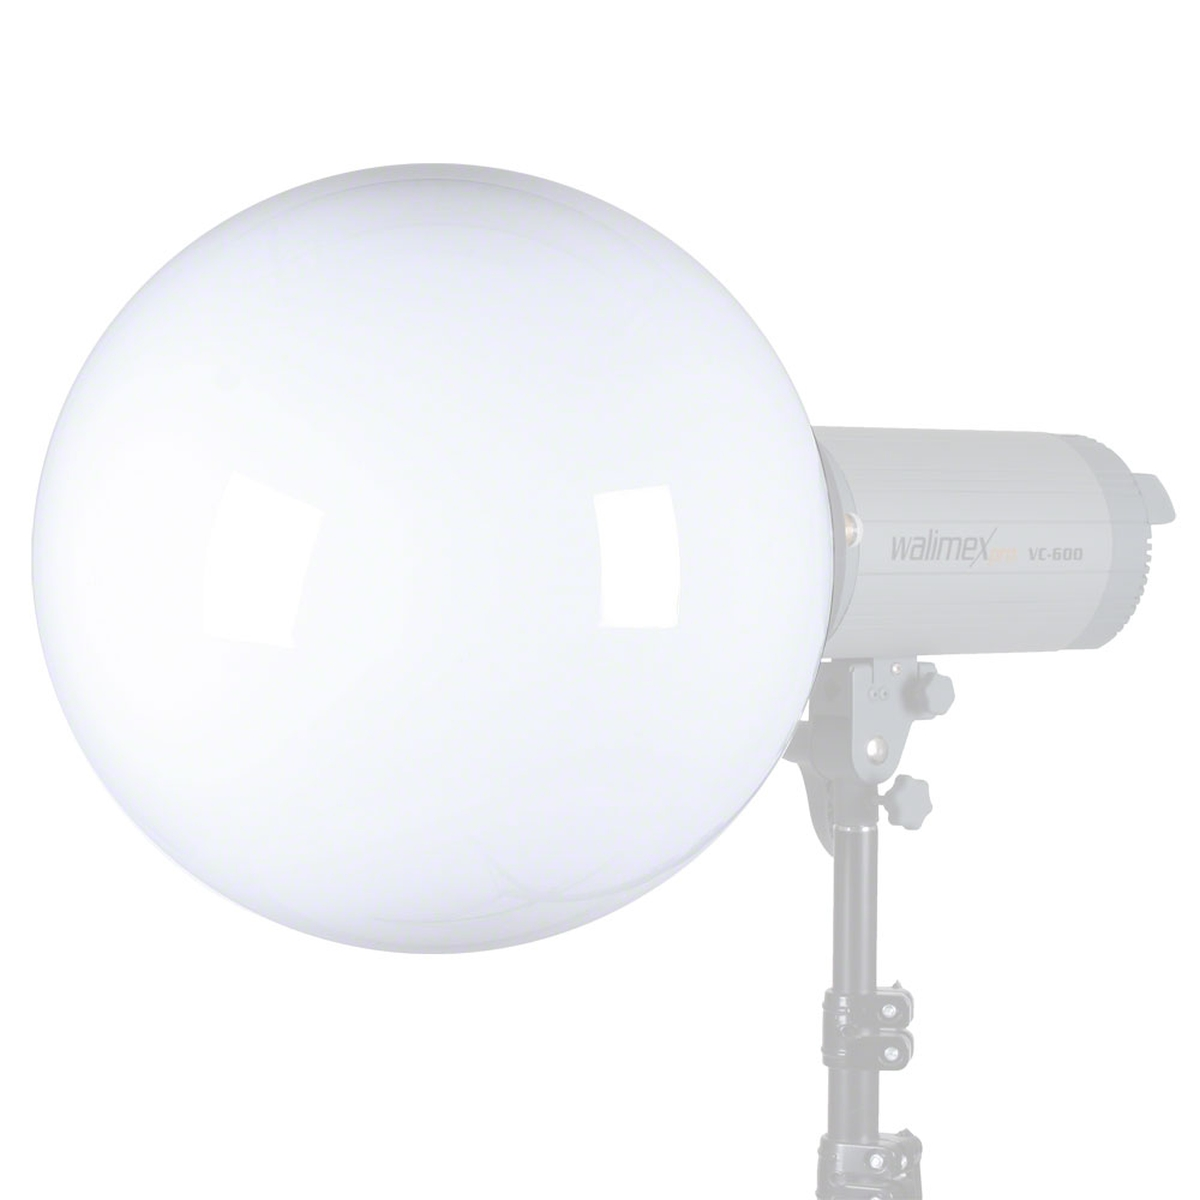 Walimex Spherical Diffuser, 30cm Aurora/Bowens